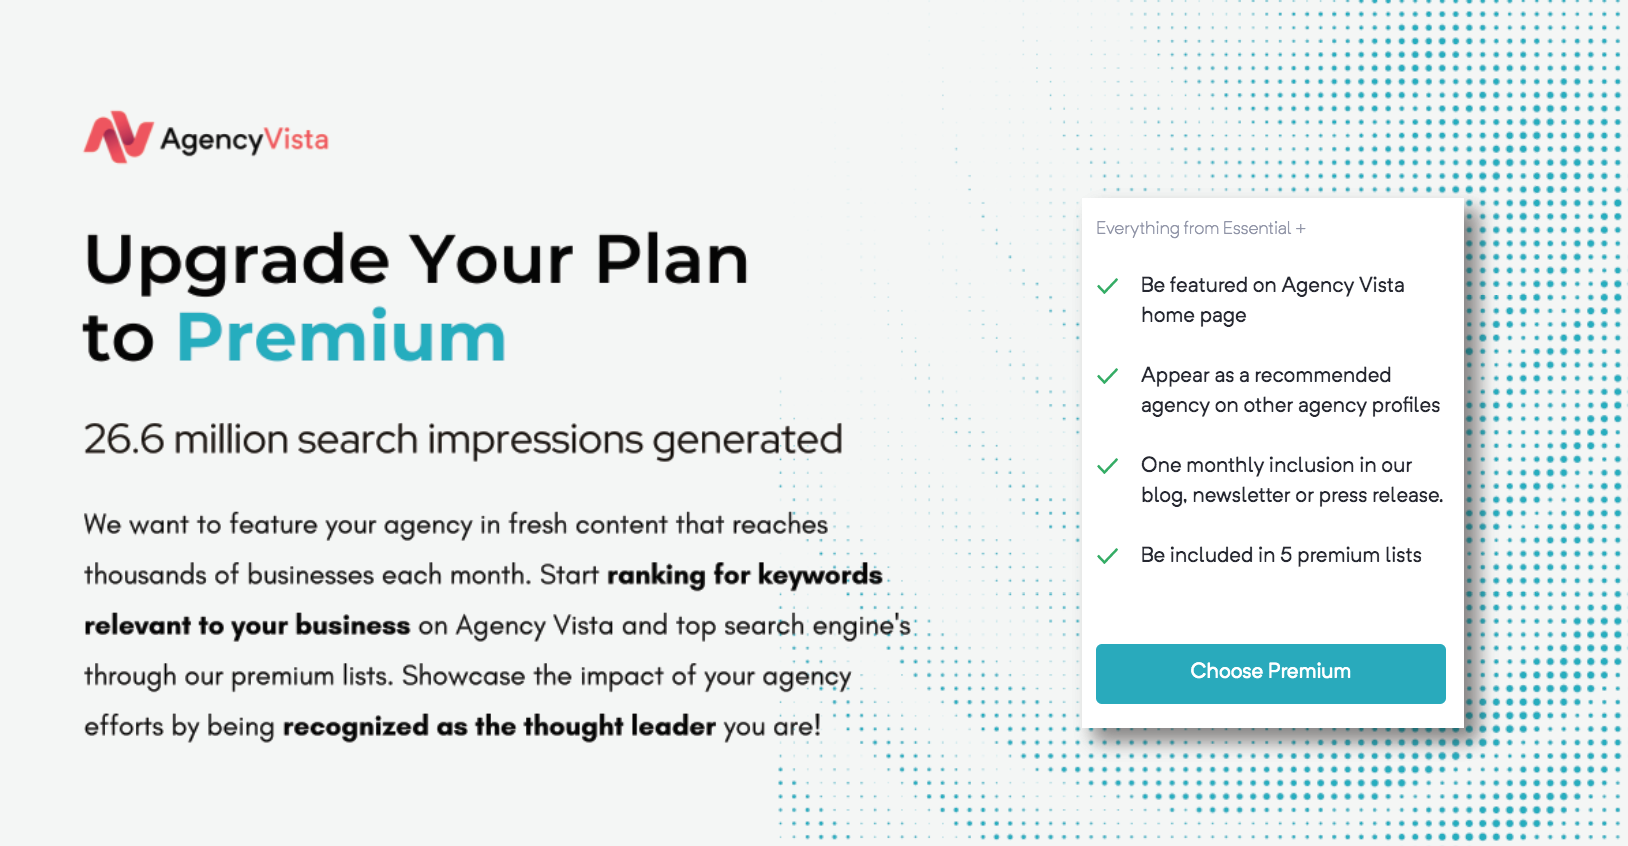 Agency Vista Upgrade Plan to Premium